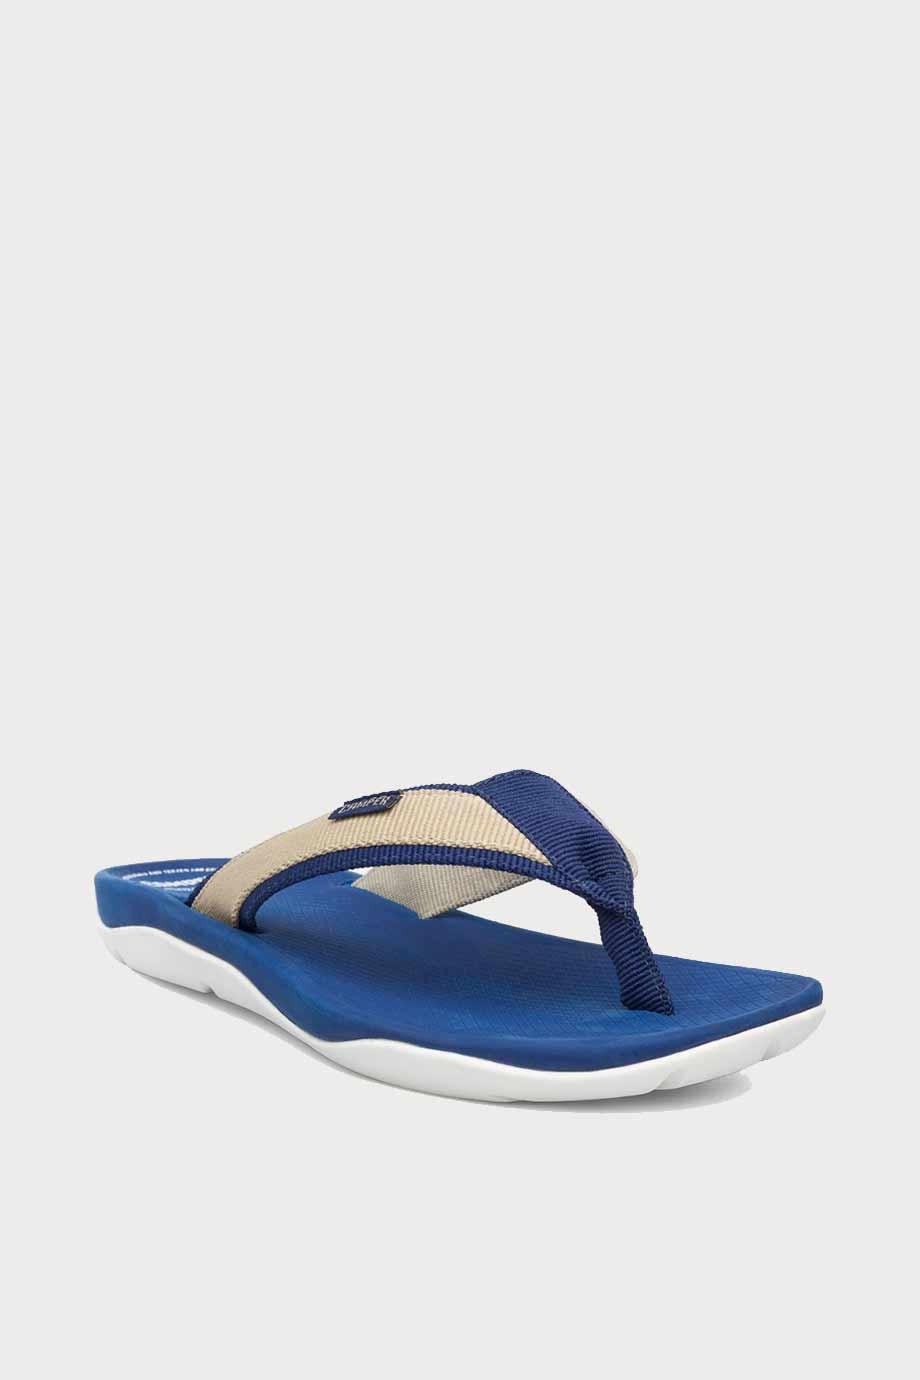 spiridoula metheniti shoes xalkida p Camper 18848 003 Match 1